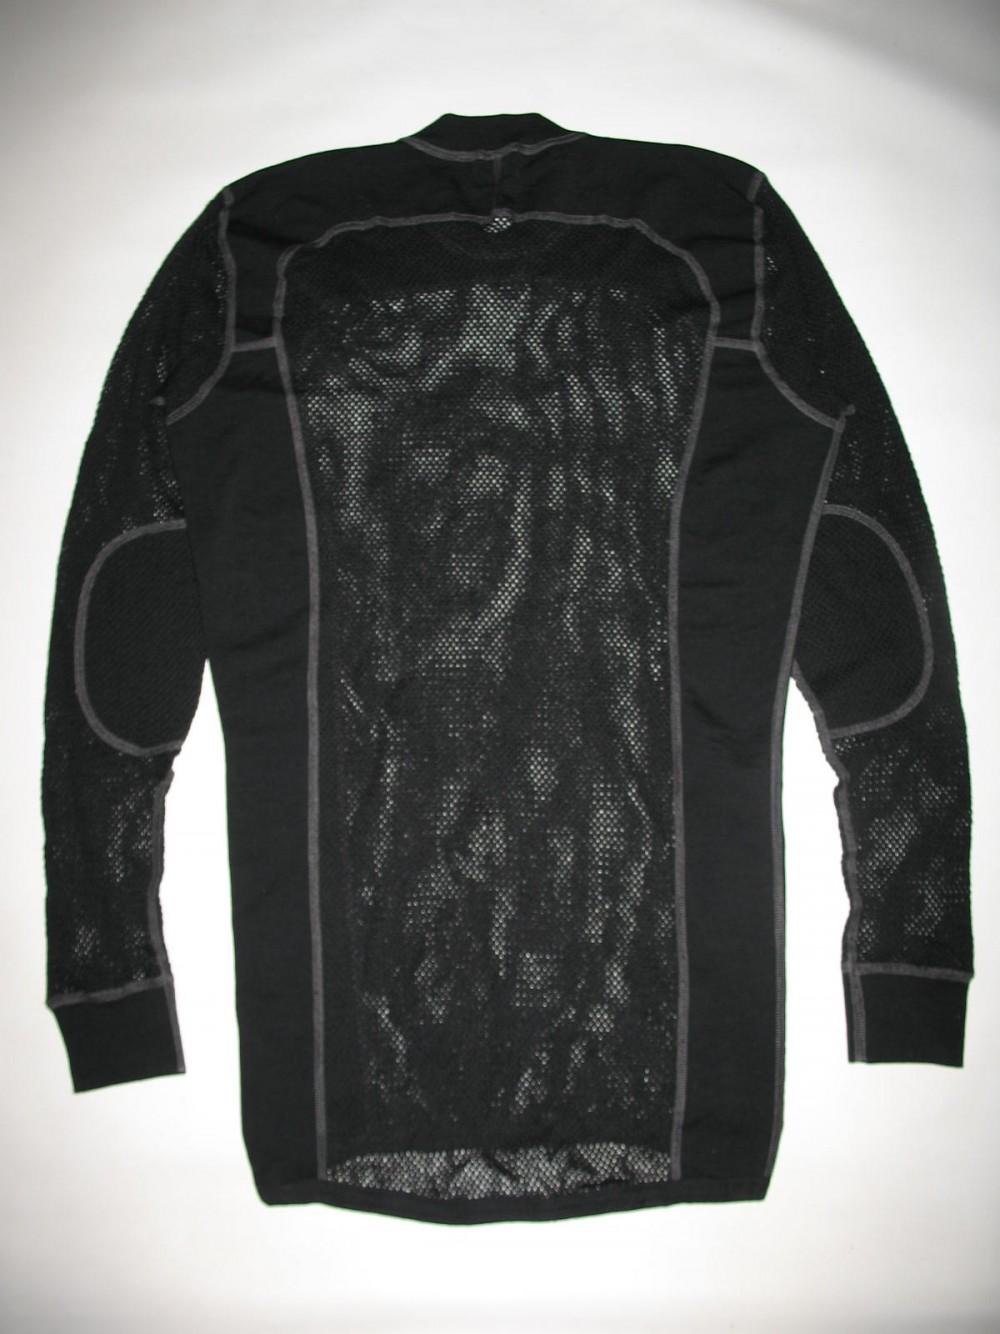 Термобелье ACLIMA 120G soft merino wool jersey (размер XL) - 4